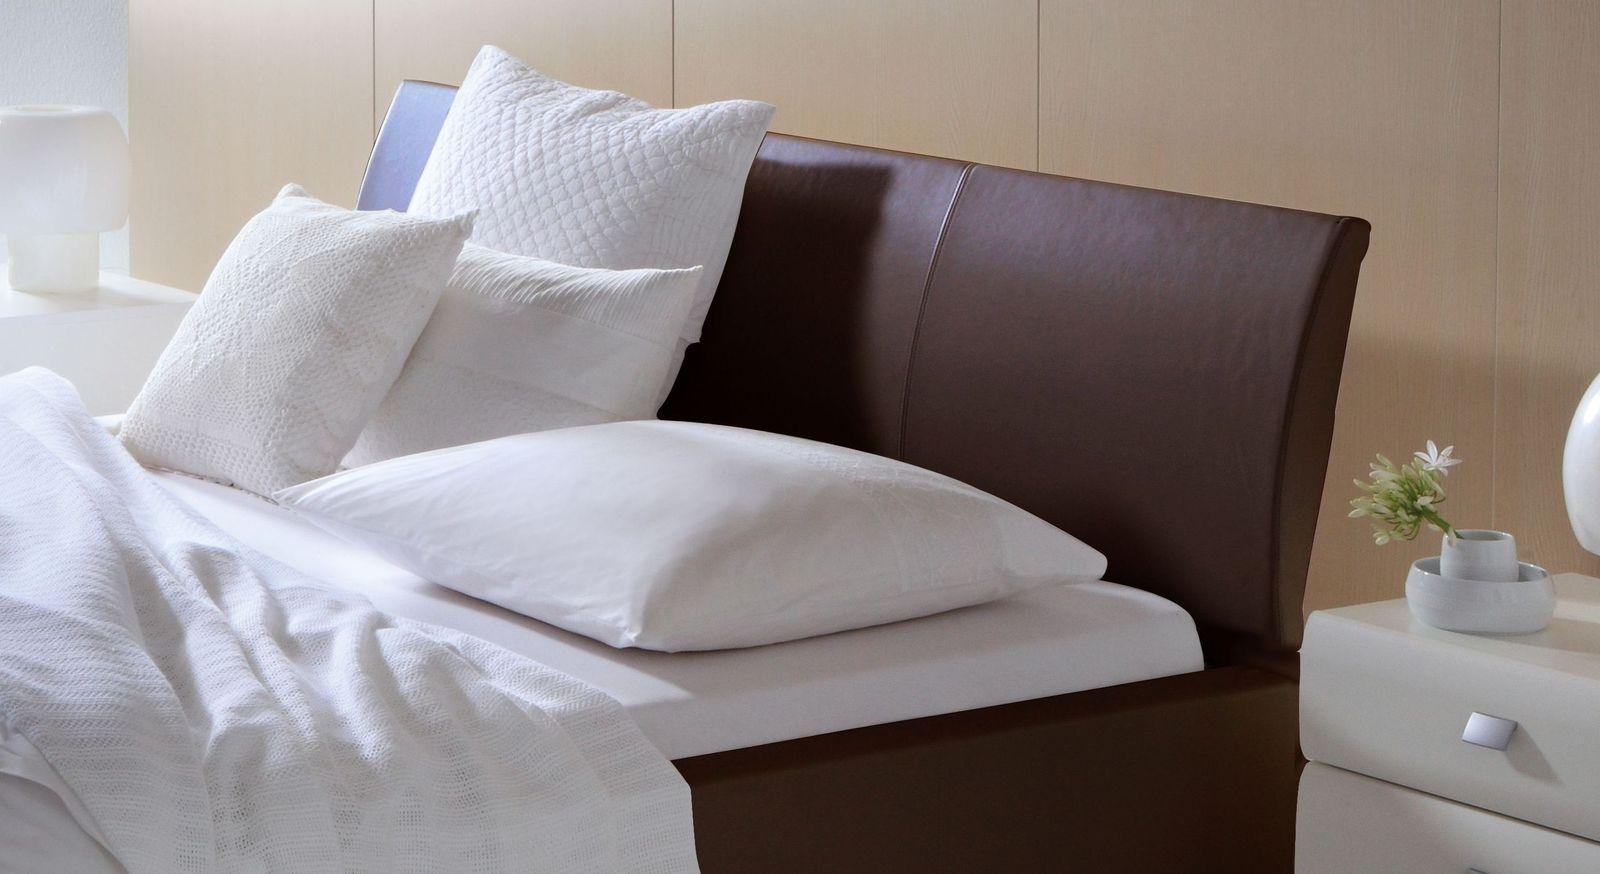 Bett Harmony mit bequem geneigtem Kopfteil